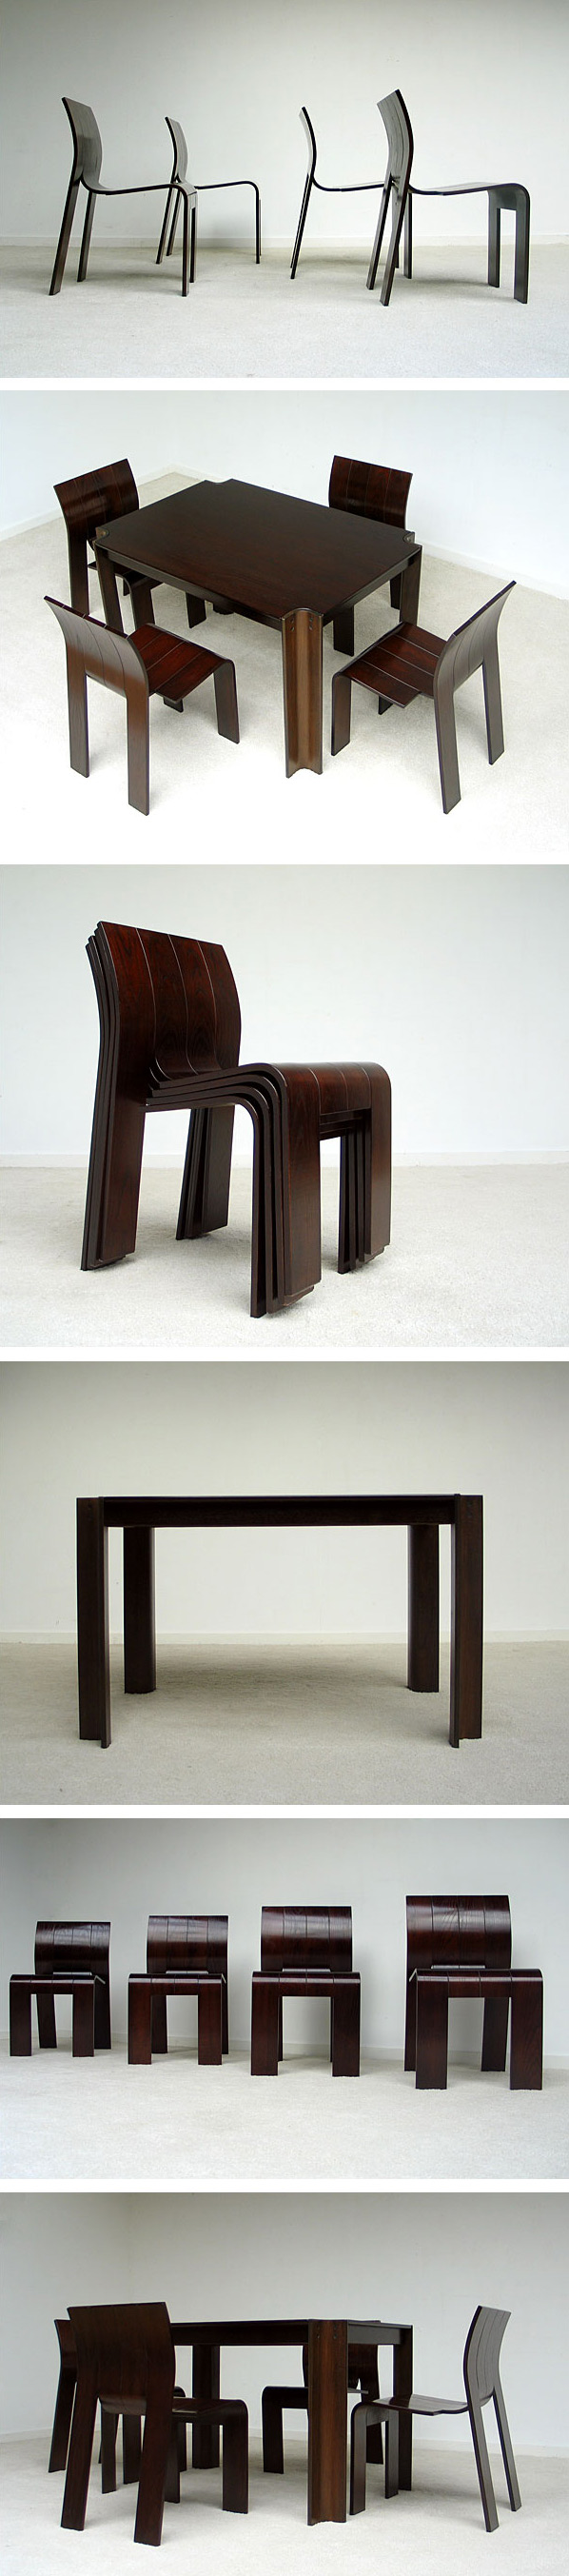 4 stripchairs SC and table Gijs Bakker Castelijn Large